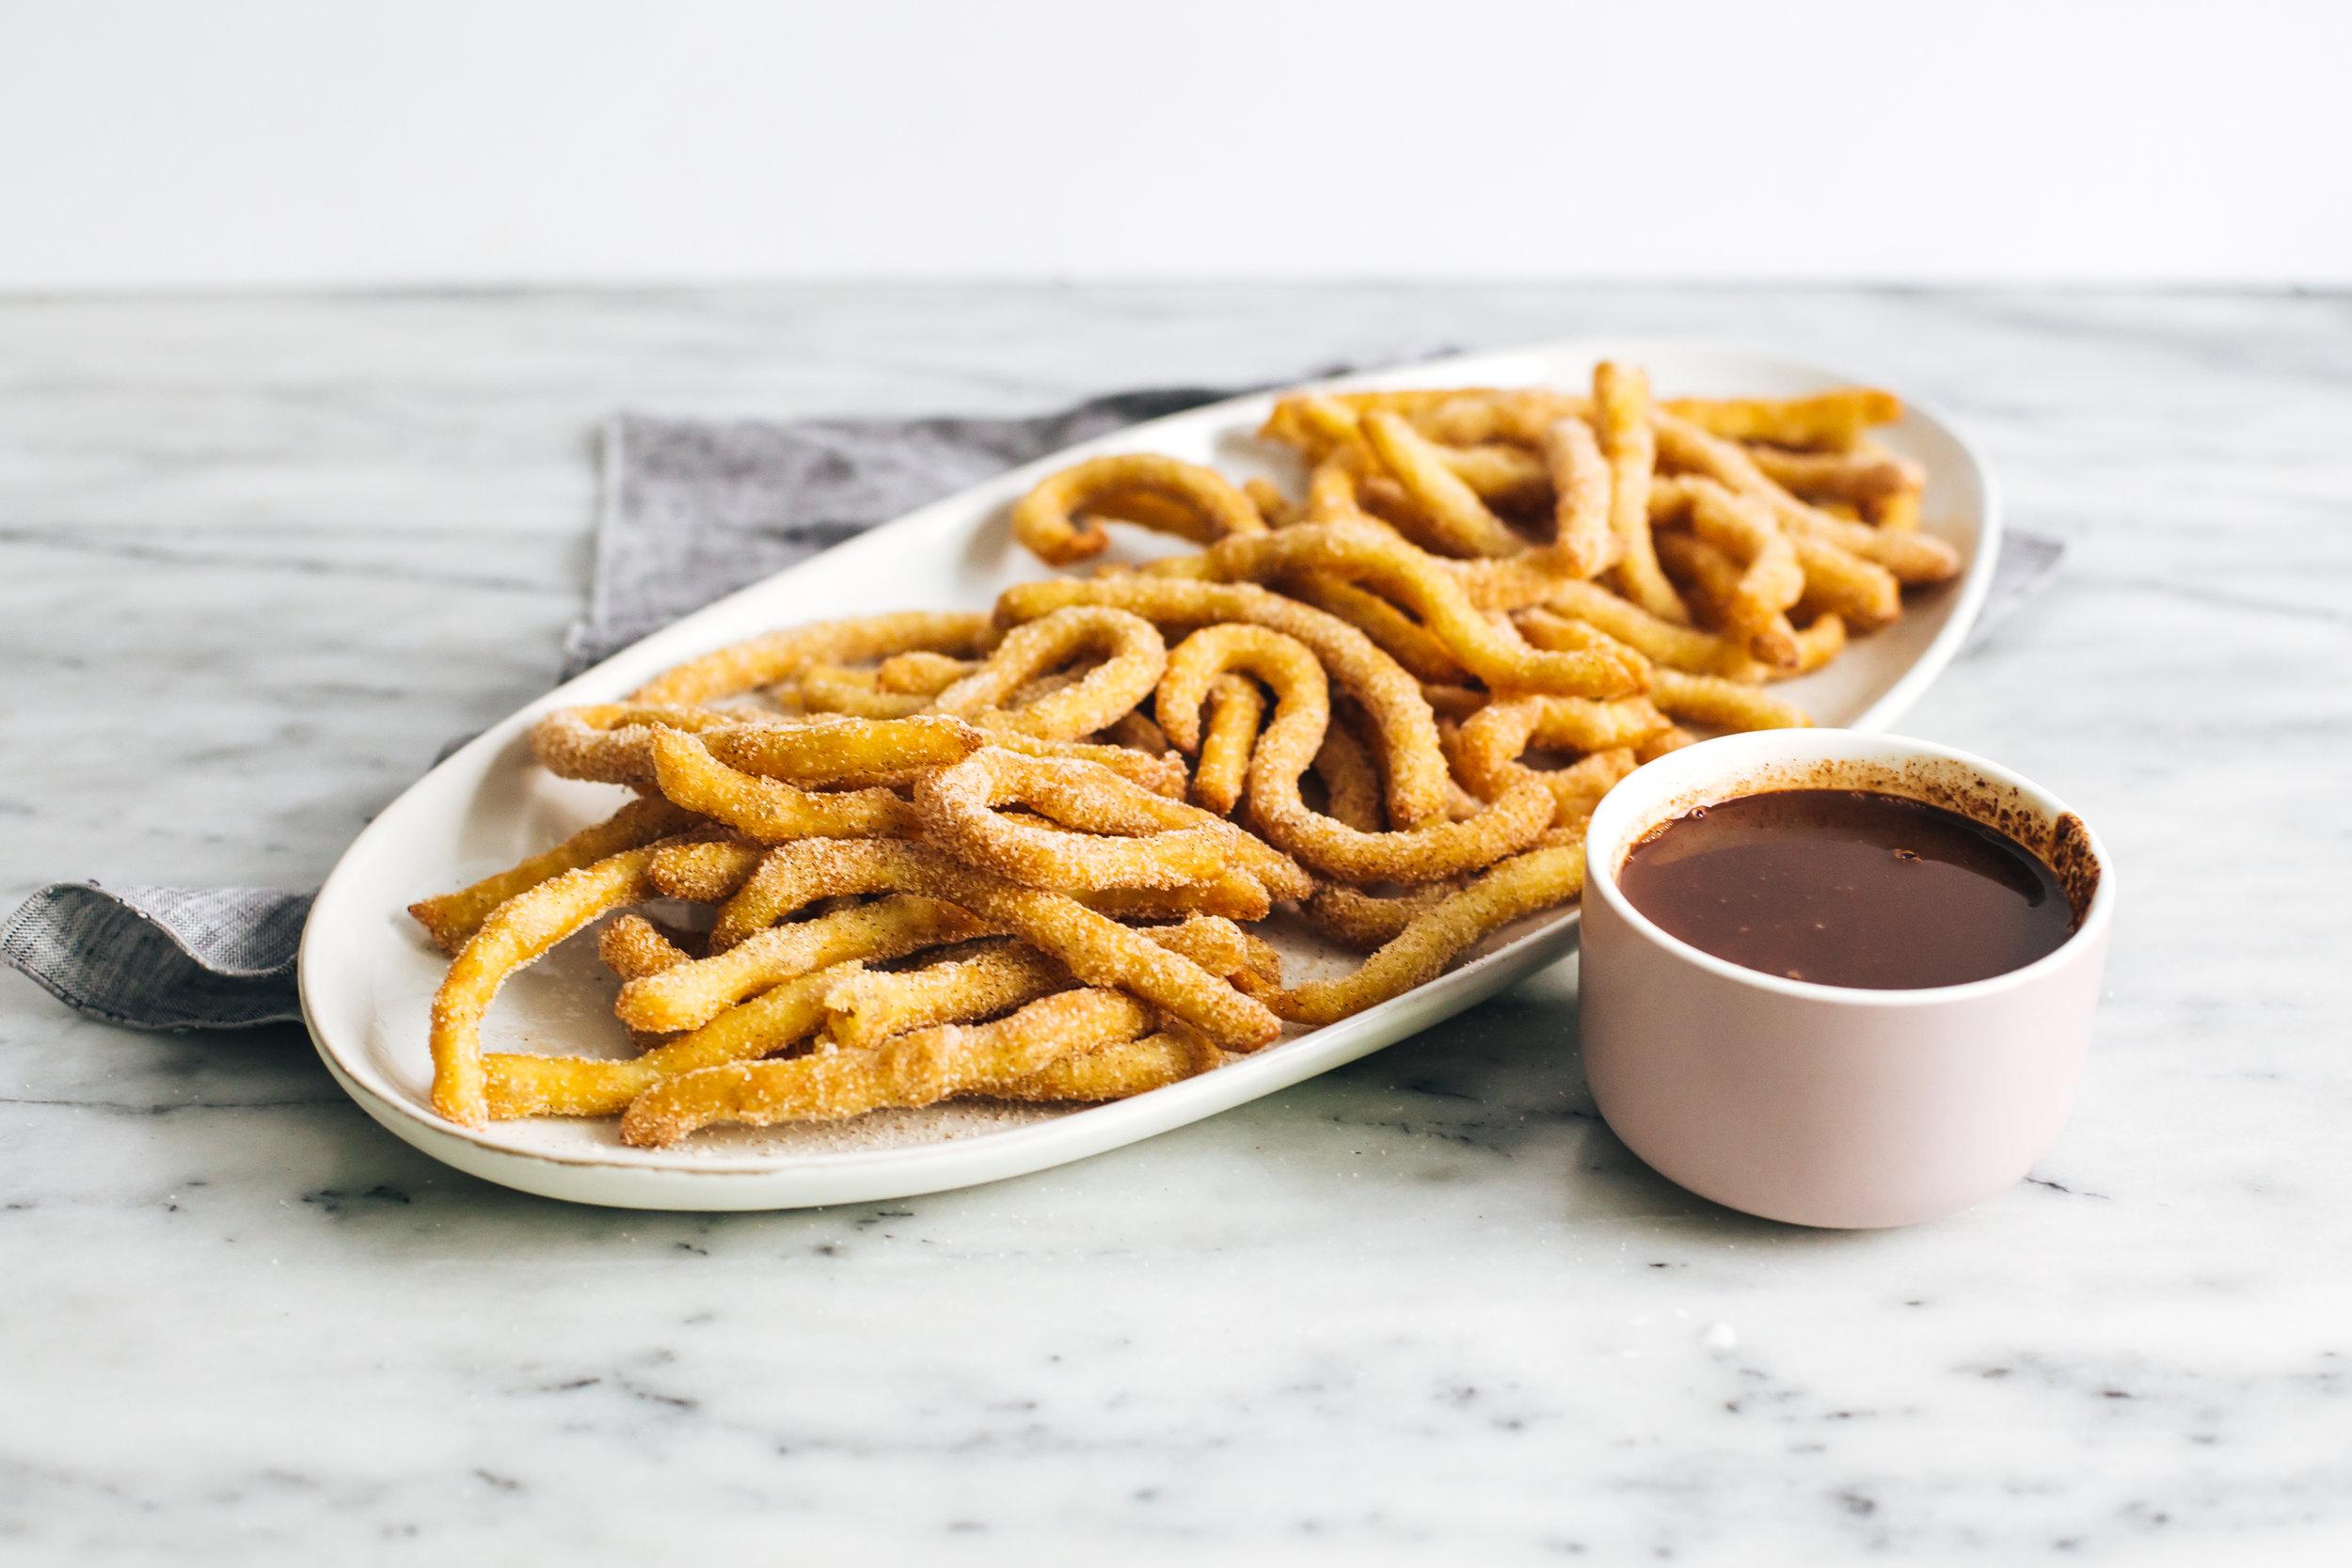 churro_fries_spicy_chocolate_dip-5.jpg